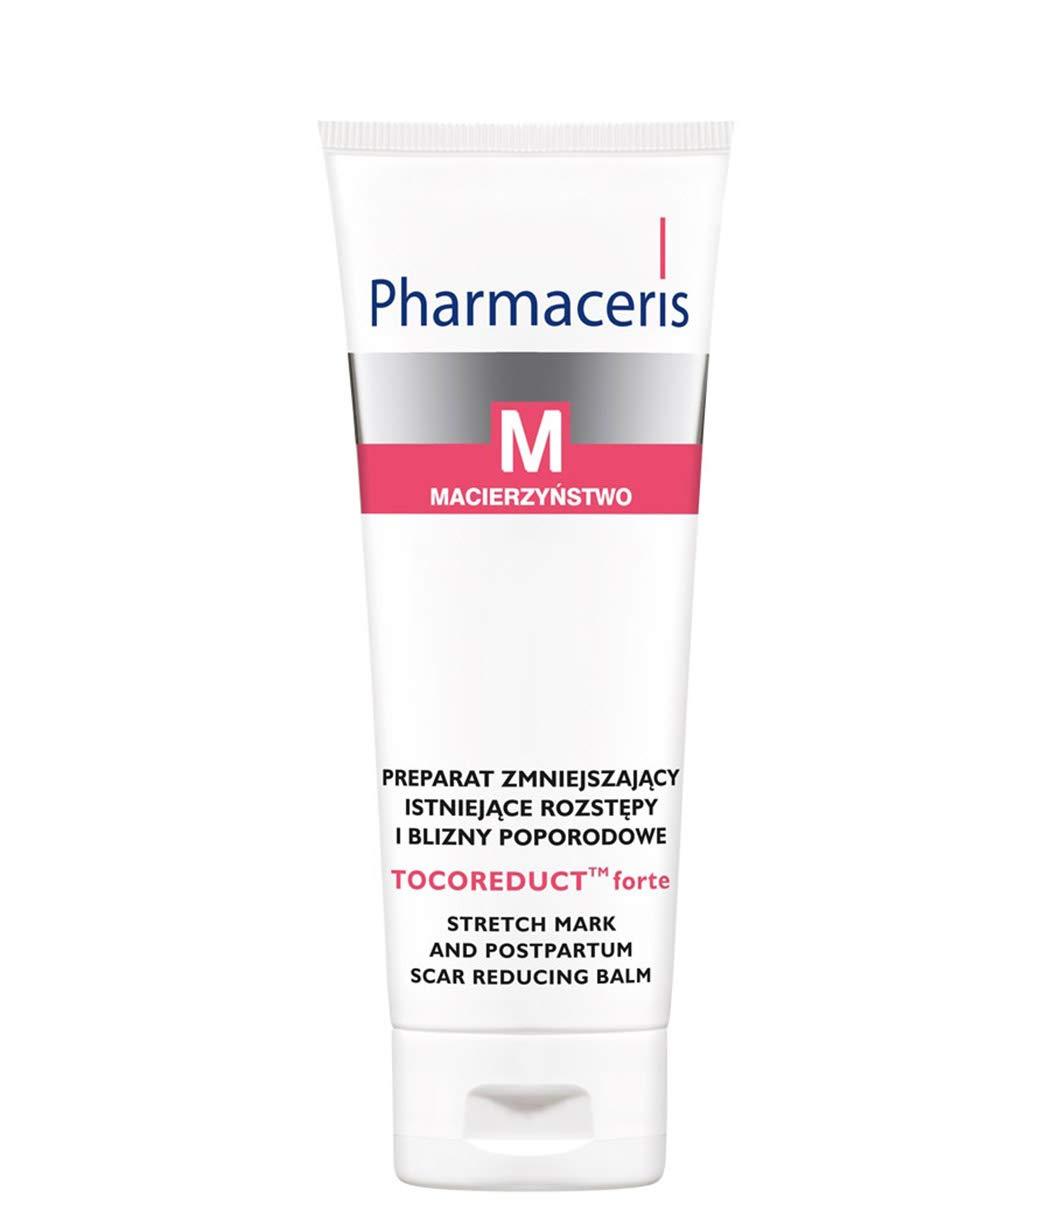 PHARMACERIS - Stretch Mark REDUCING Balm TOCOREDUCTTM Forte - 75 ml